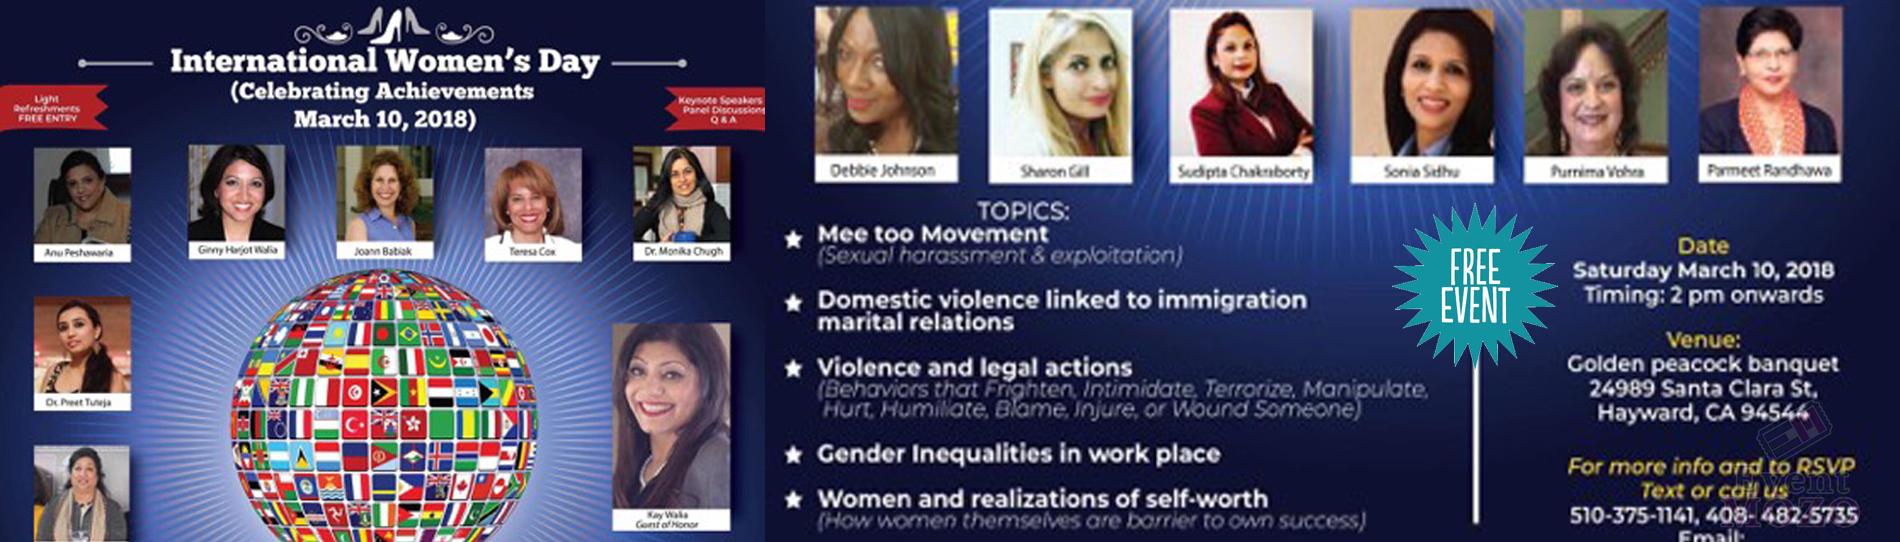 EventMozo International Women's day